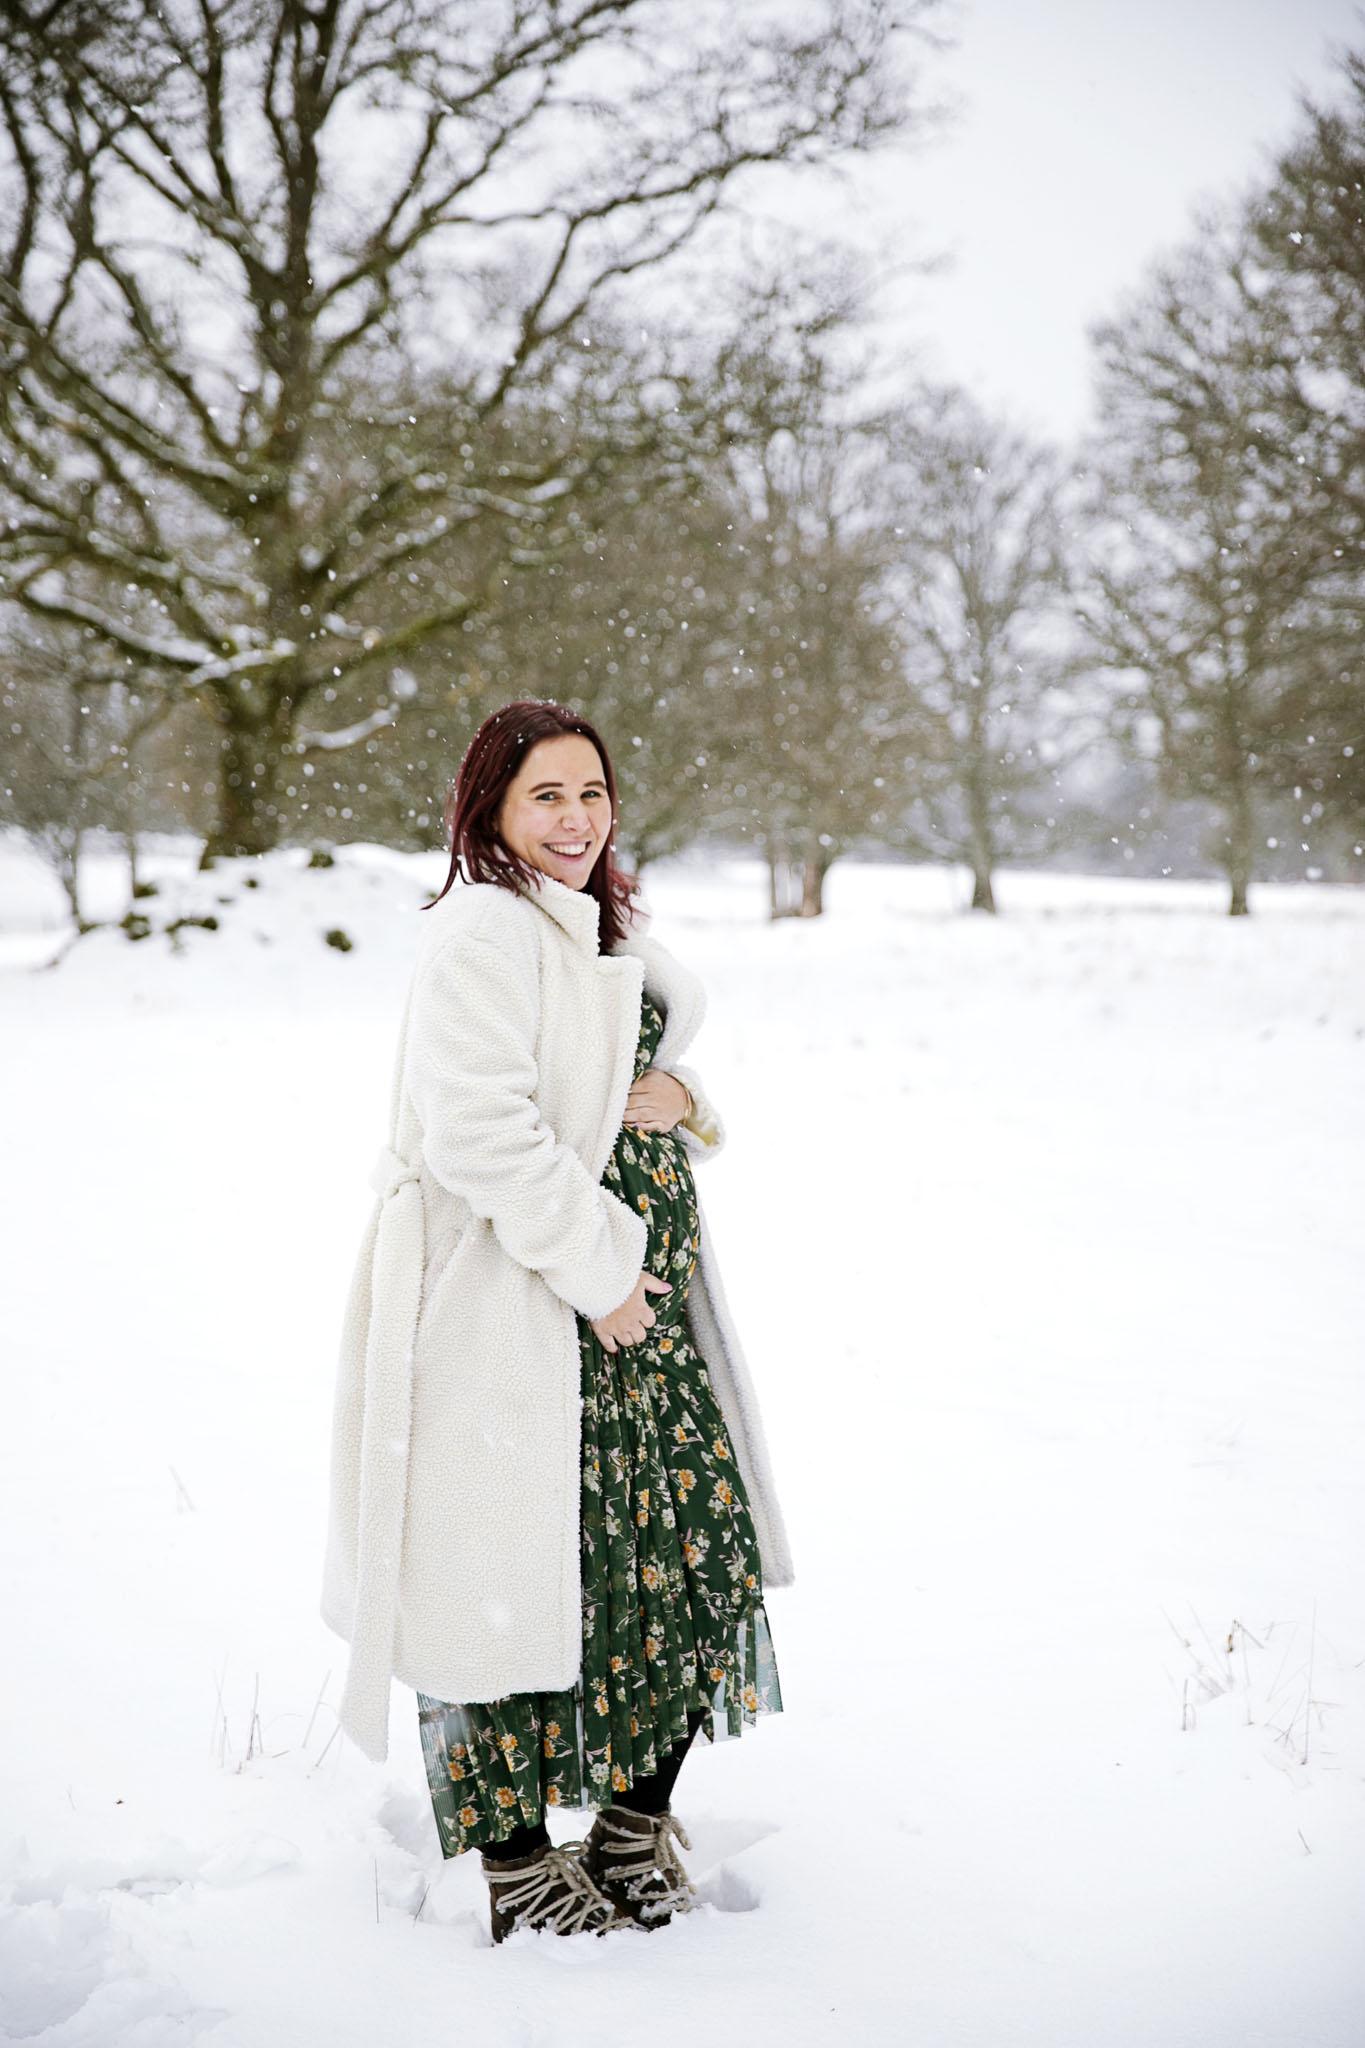 Fotografera din gravidmage hos gravidfotografen fotograf emy, halmstad och laholm